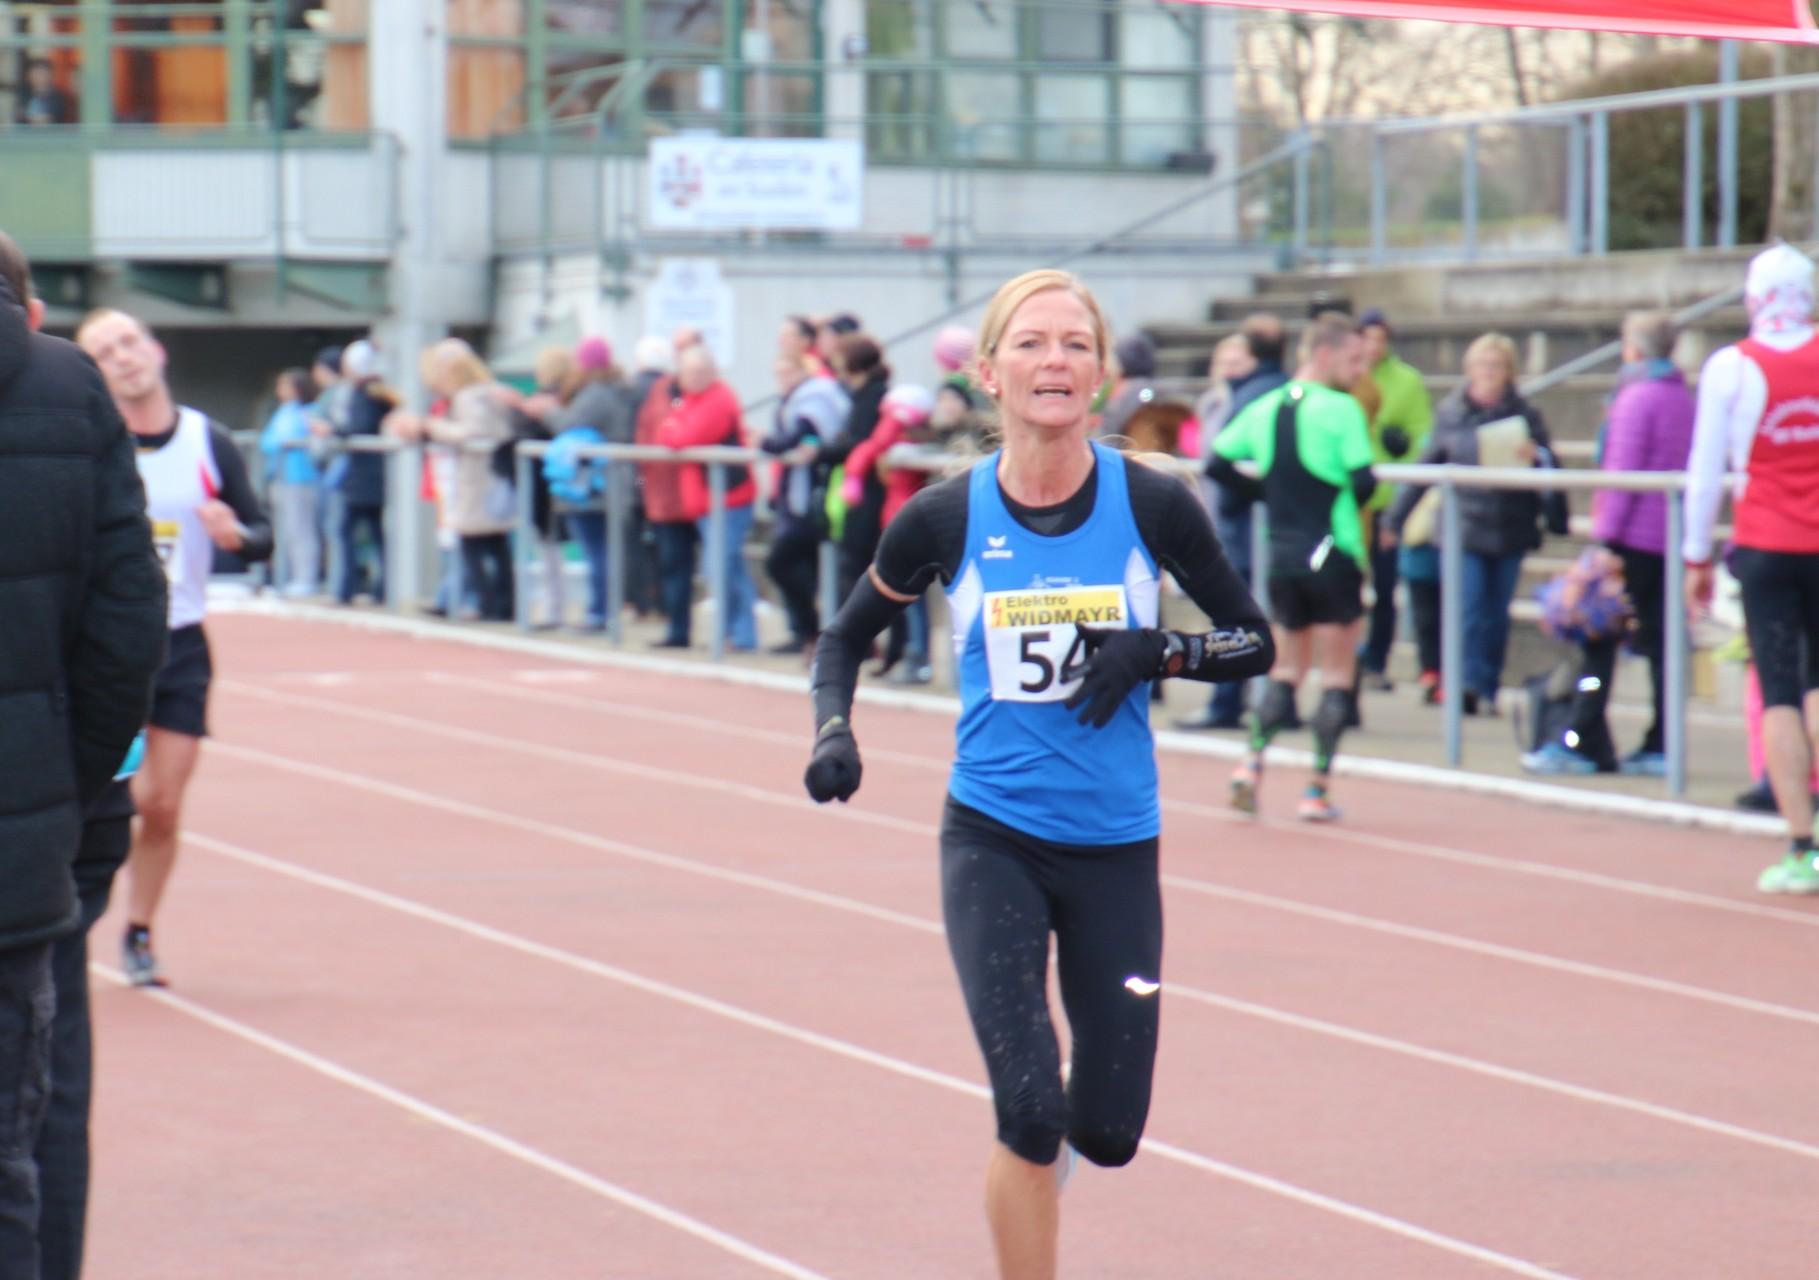 3.Platz Frauen: Zettel Michaela TG Viktoria